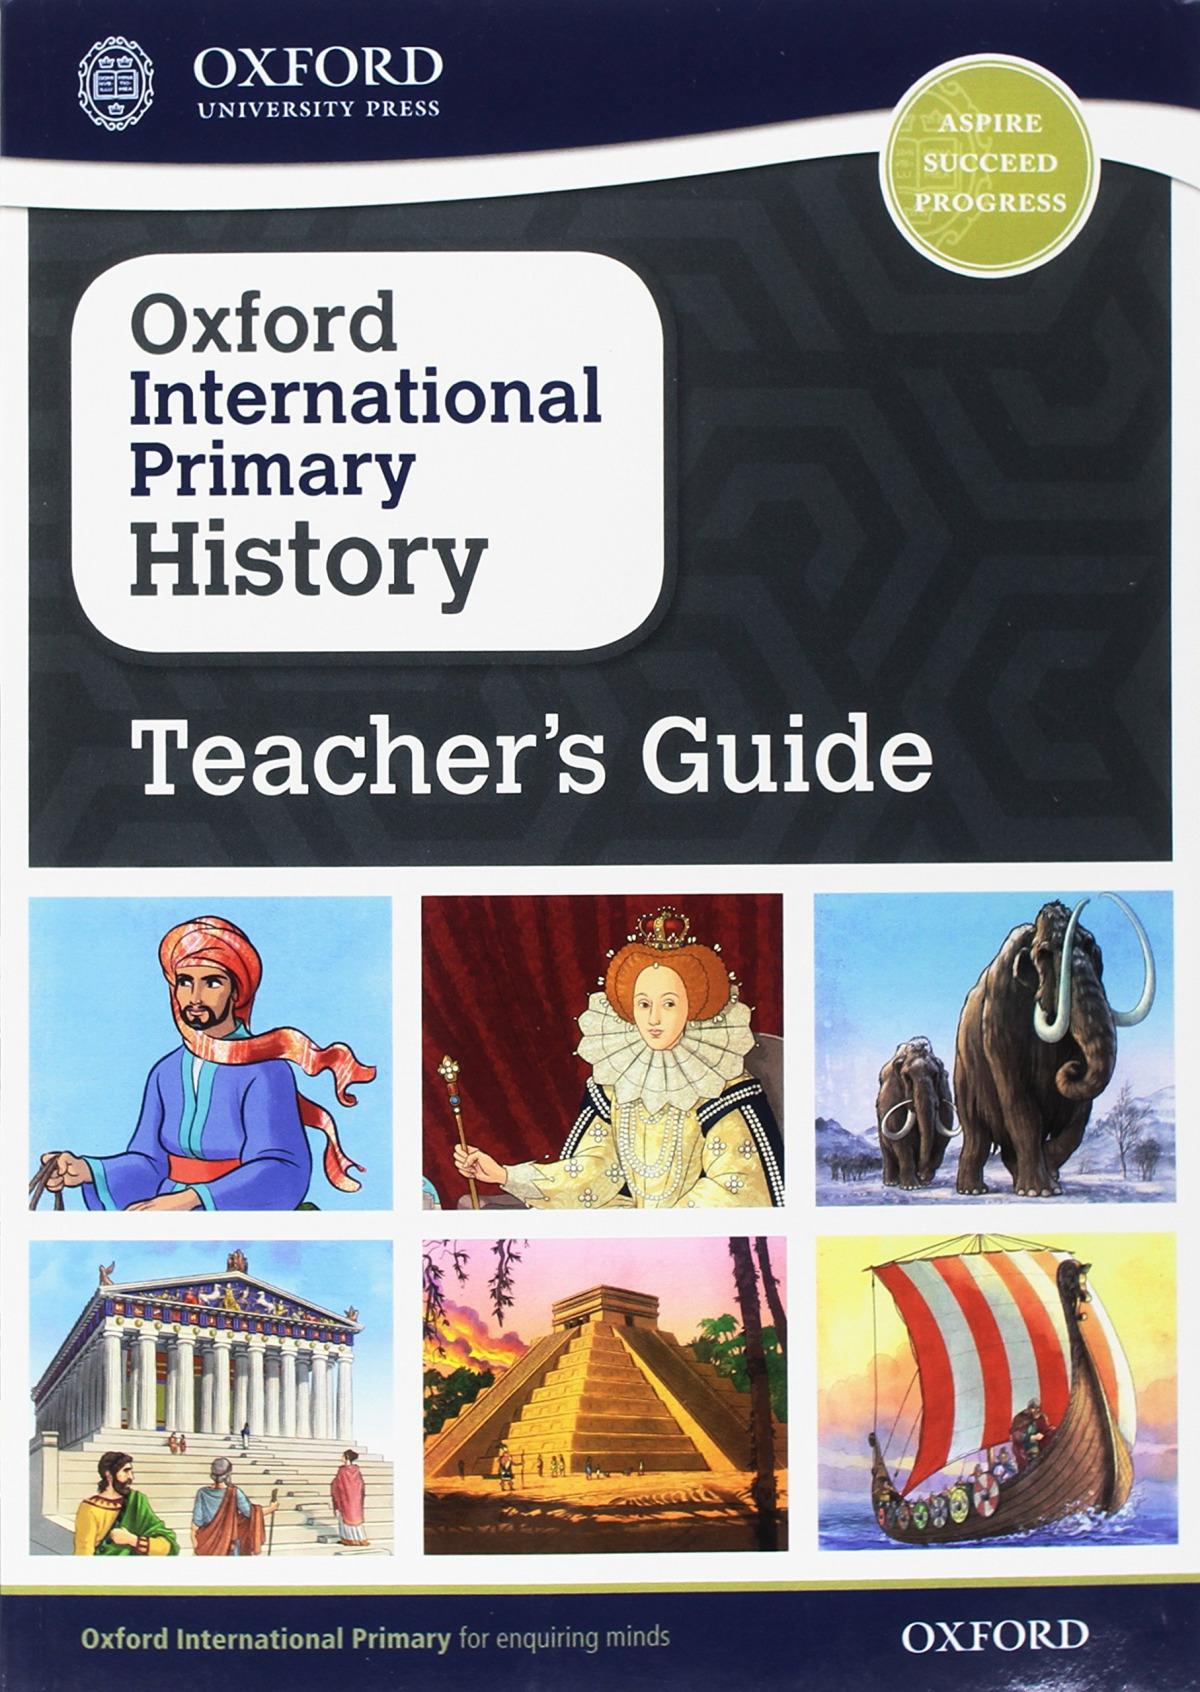 OXFORD INTERNATIONAL PRIMARY HISTORY TEACHER GUIDE